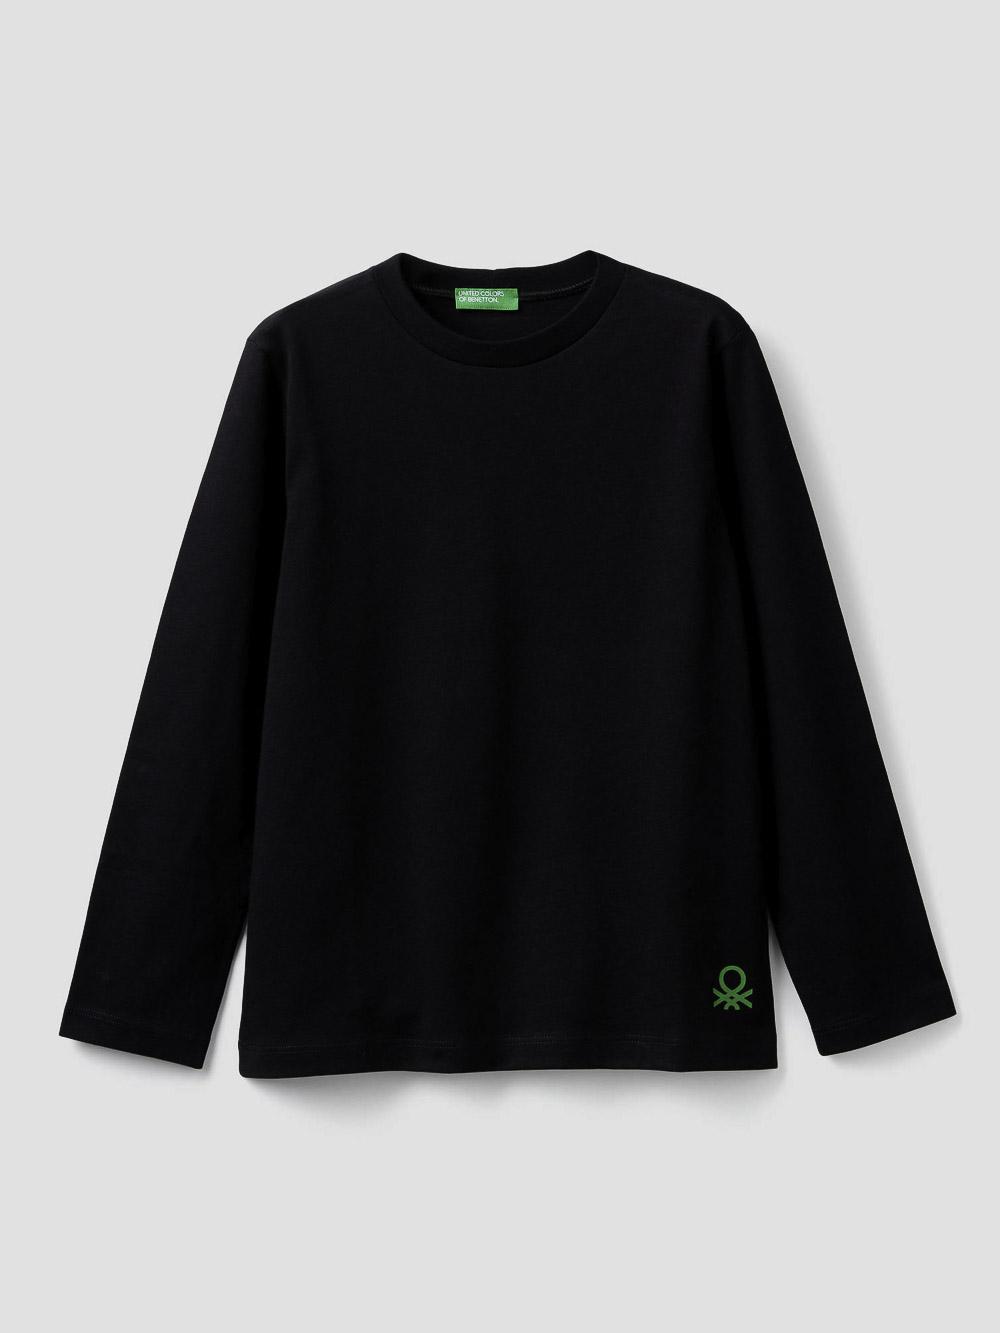 012 BENETTON T-shirt 100% οργανικό βαμβακερό 3I1XC14QD 20A100